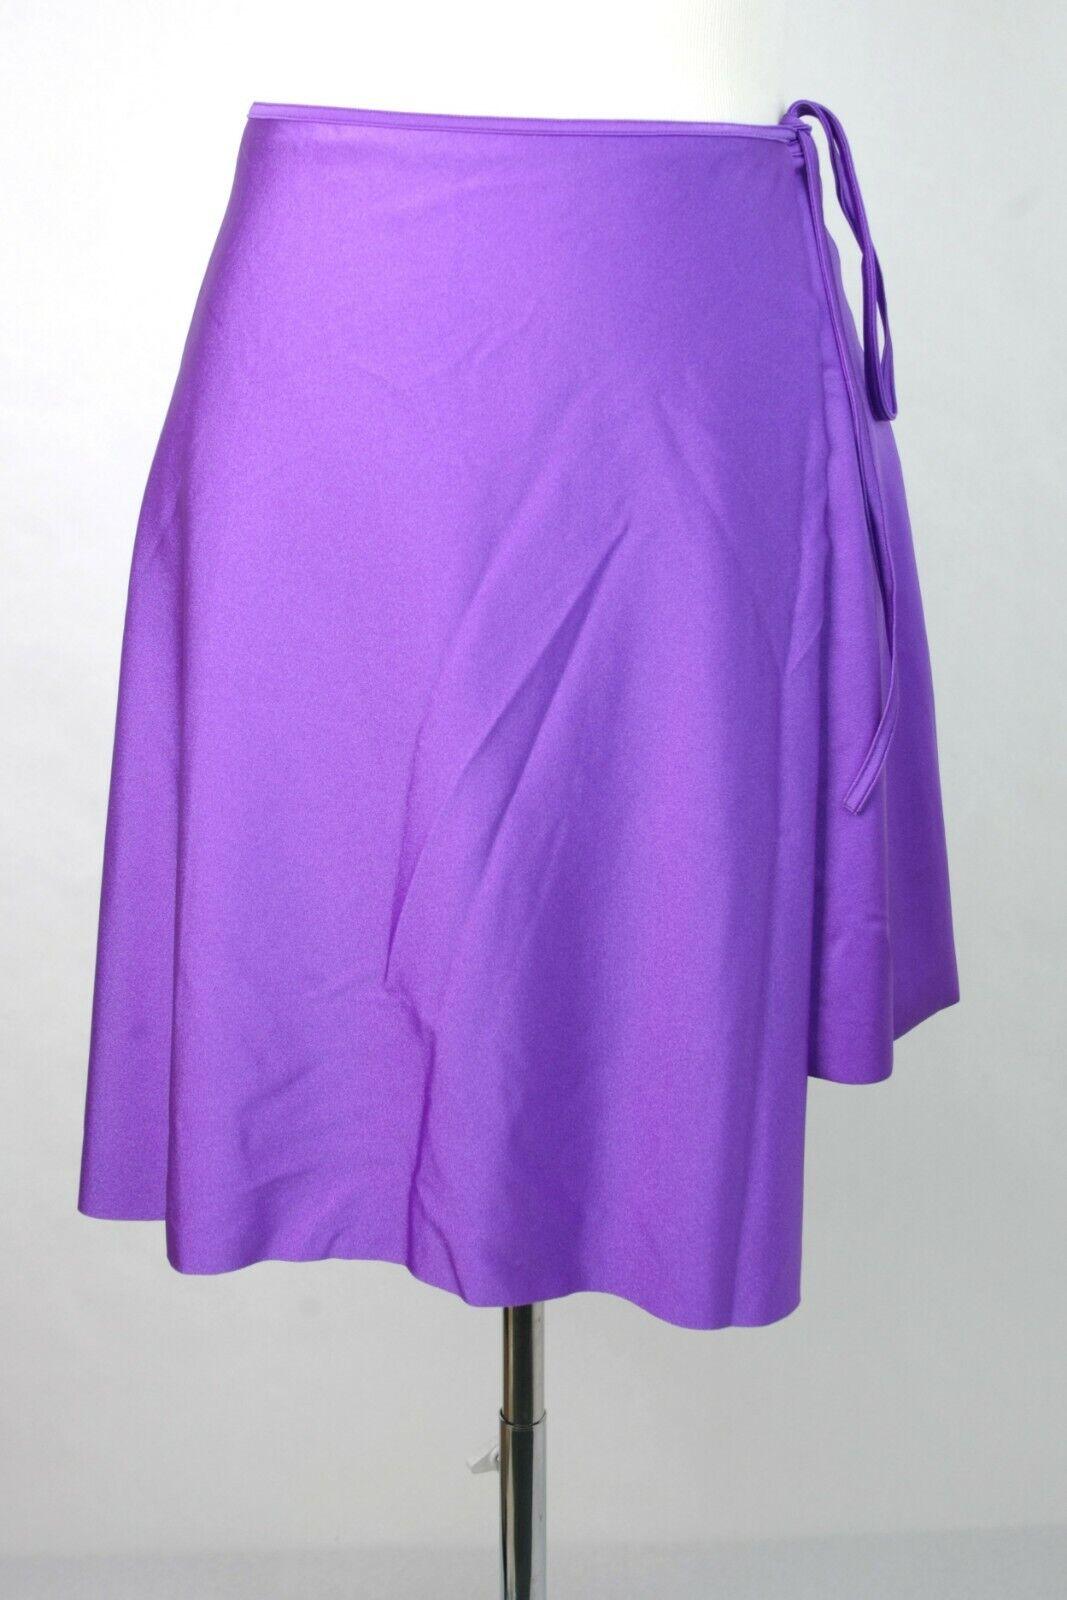 New Balenciaga Women's Purple Spandex Wrap Skirt 470936 5100